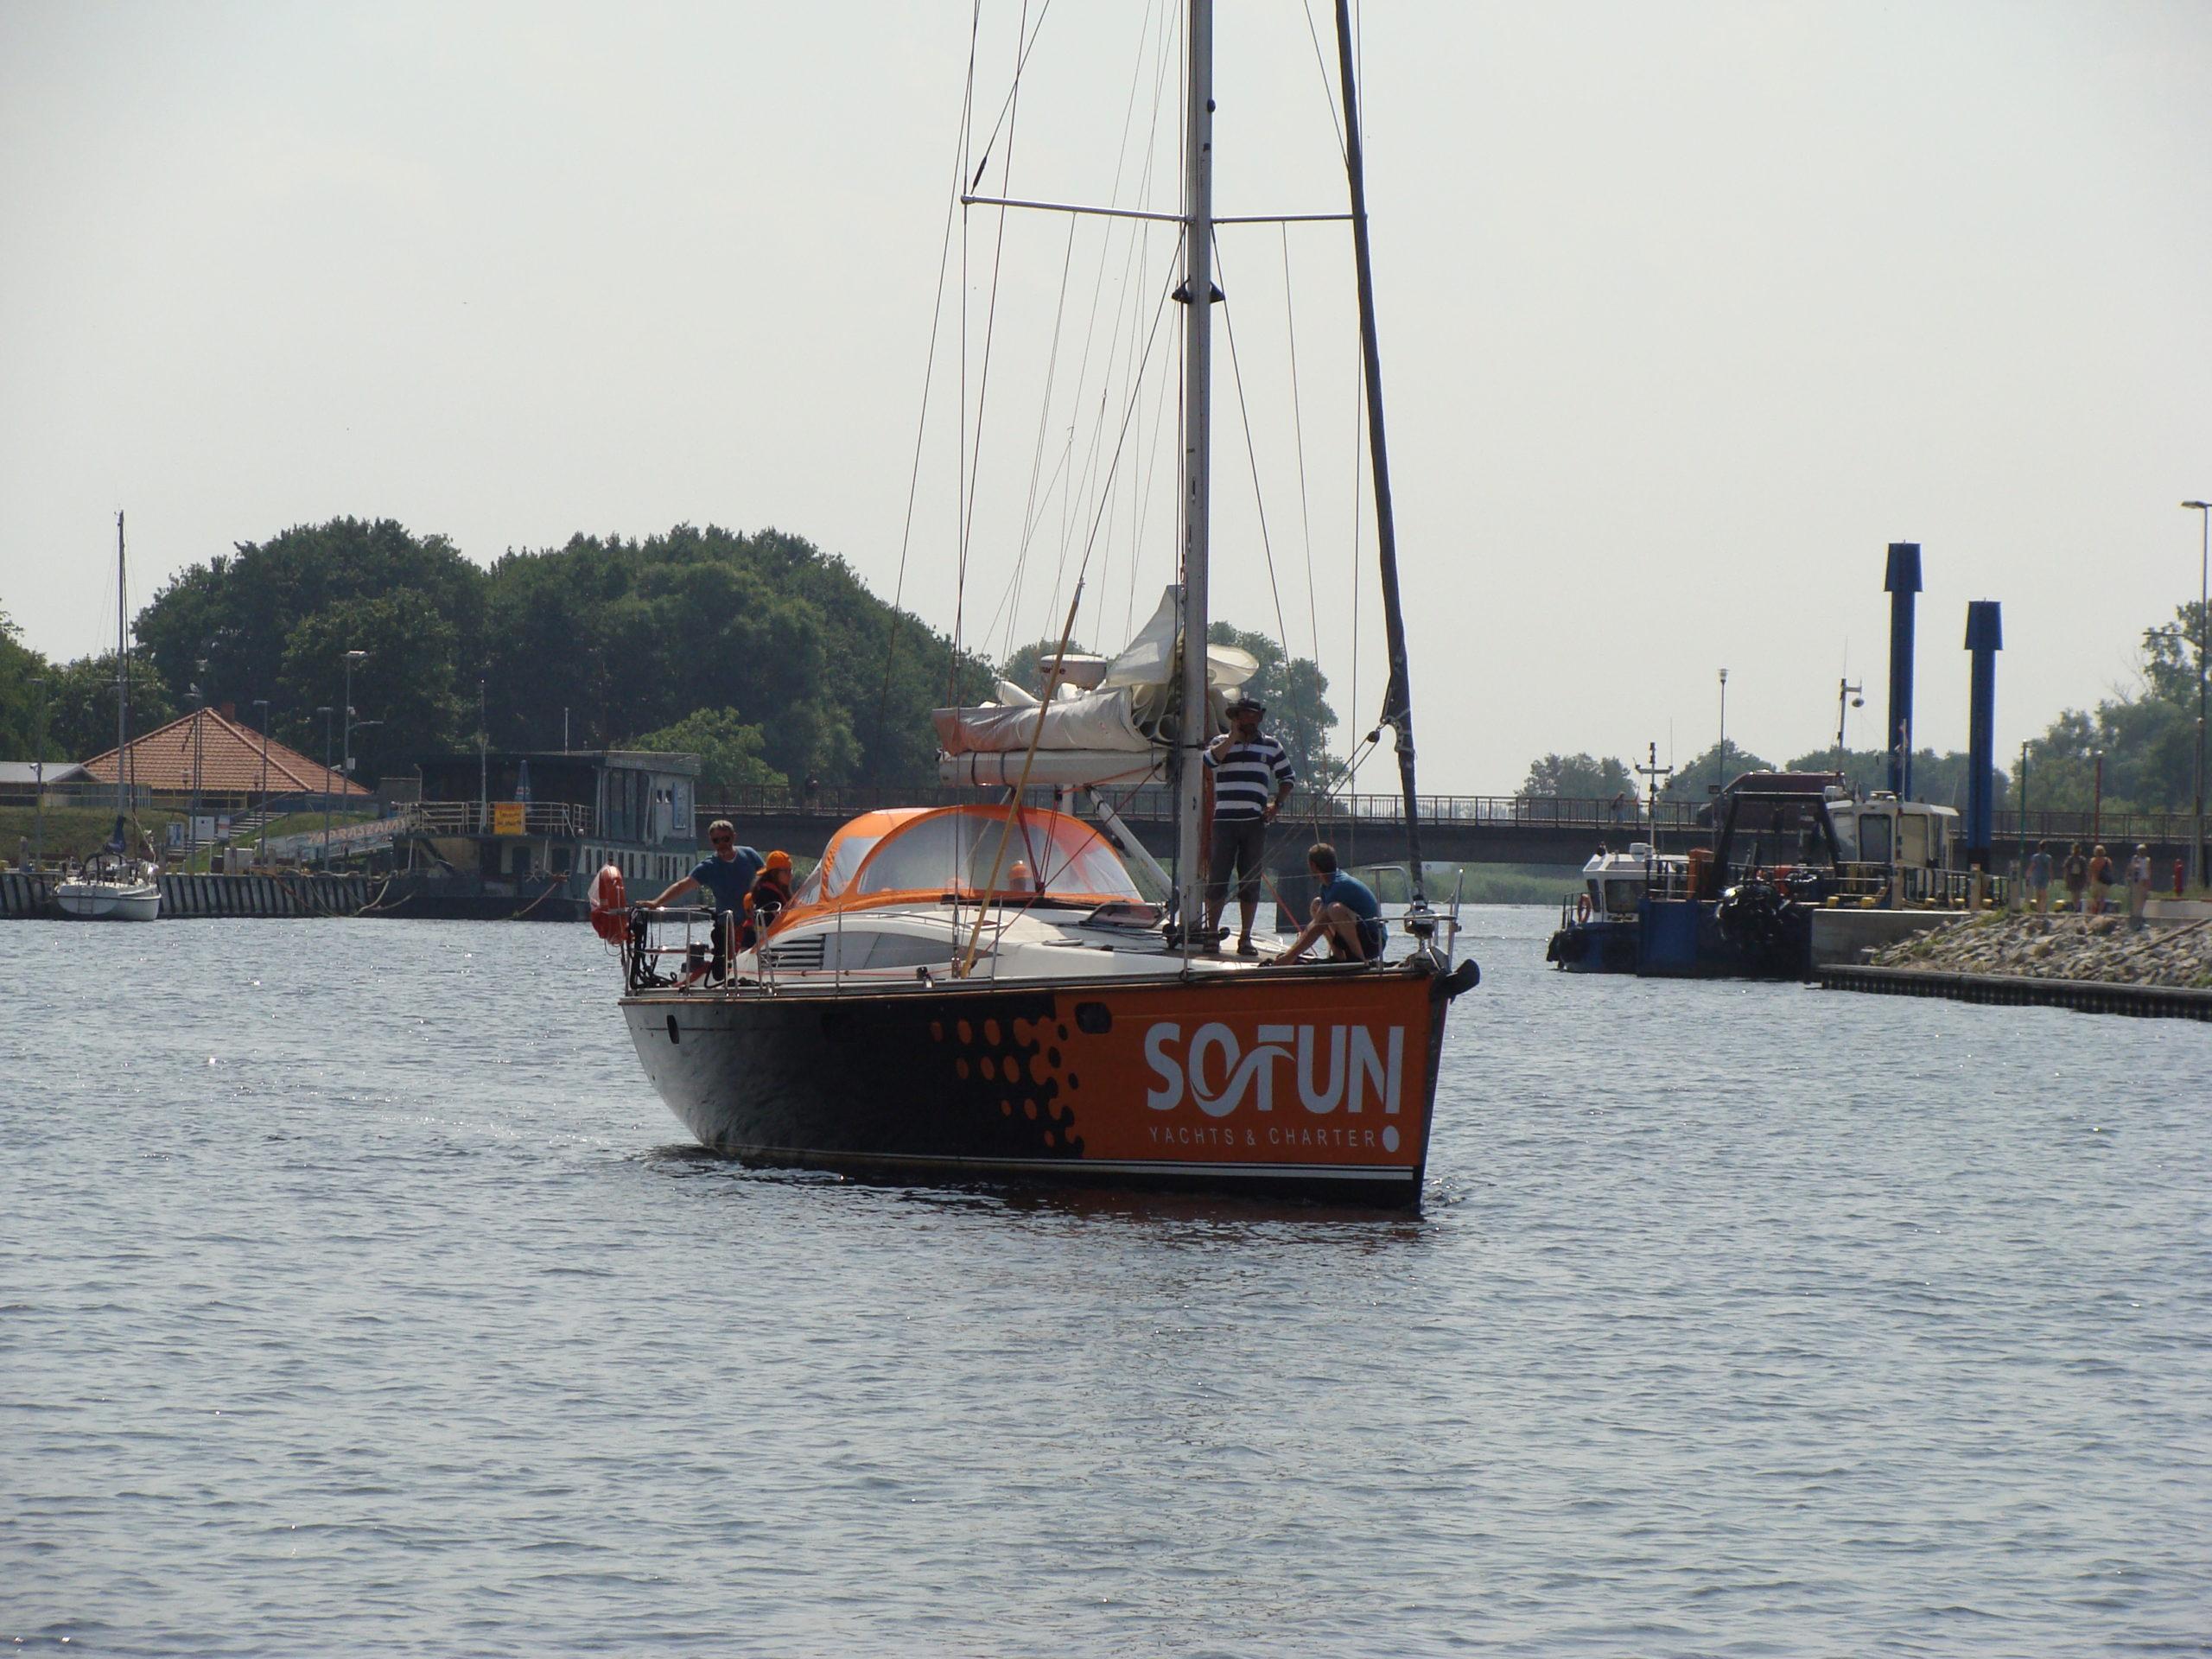 Jacht morski 5